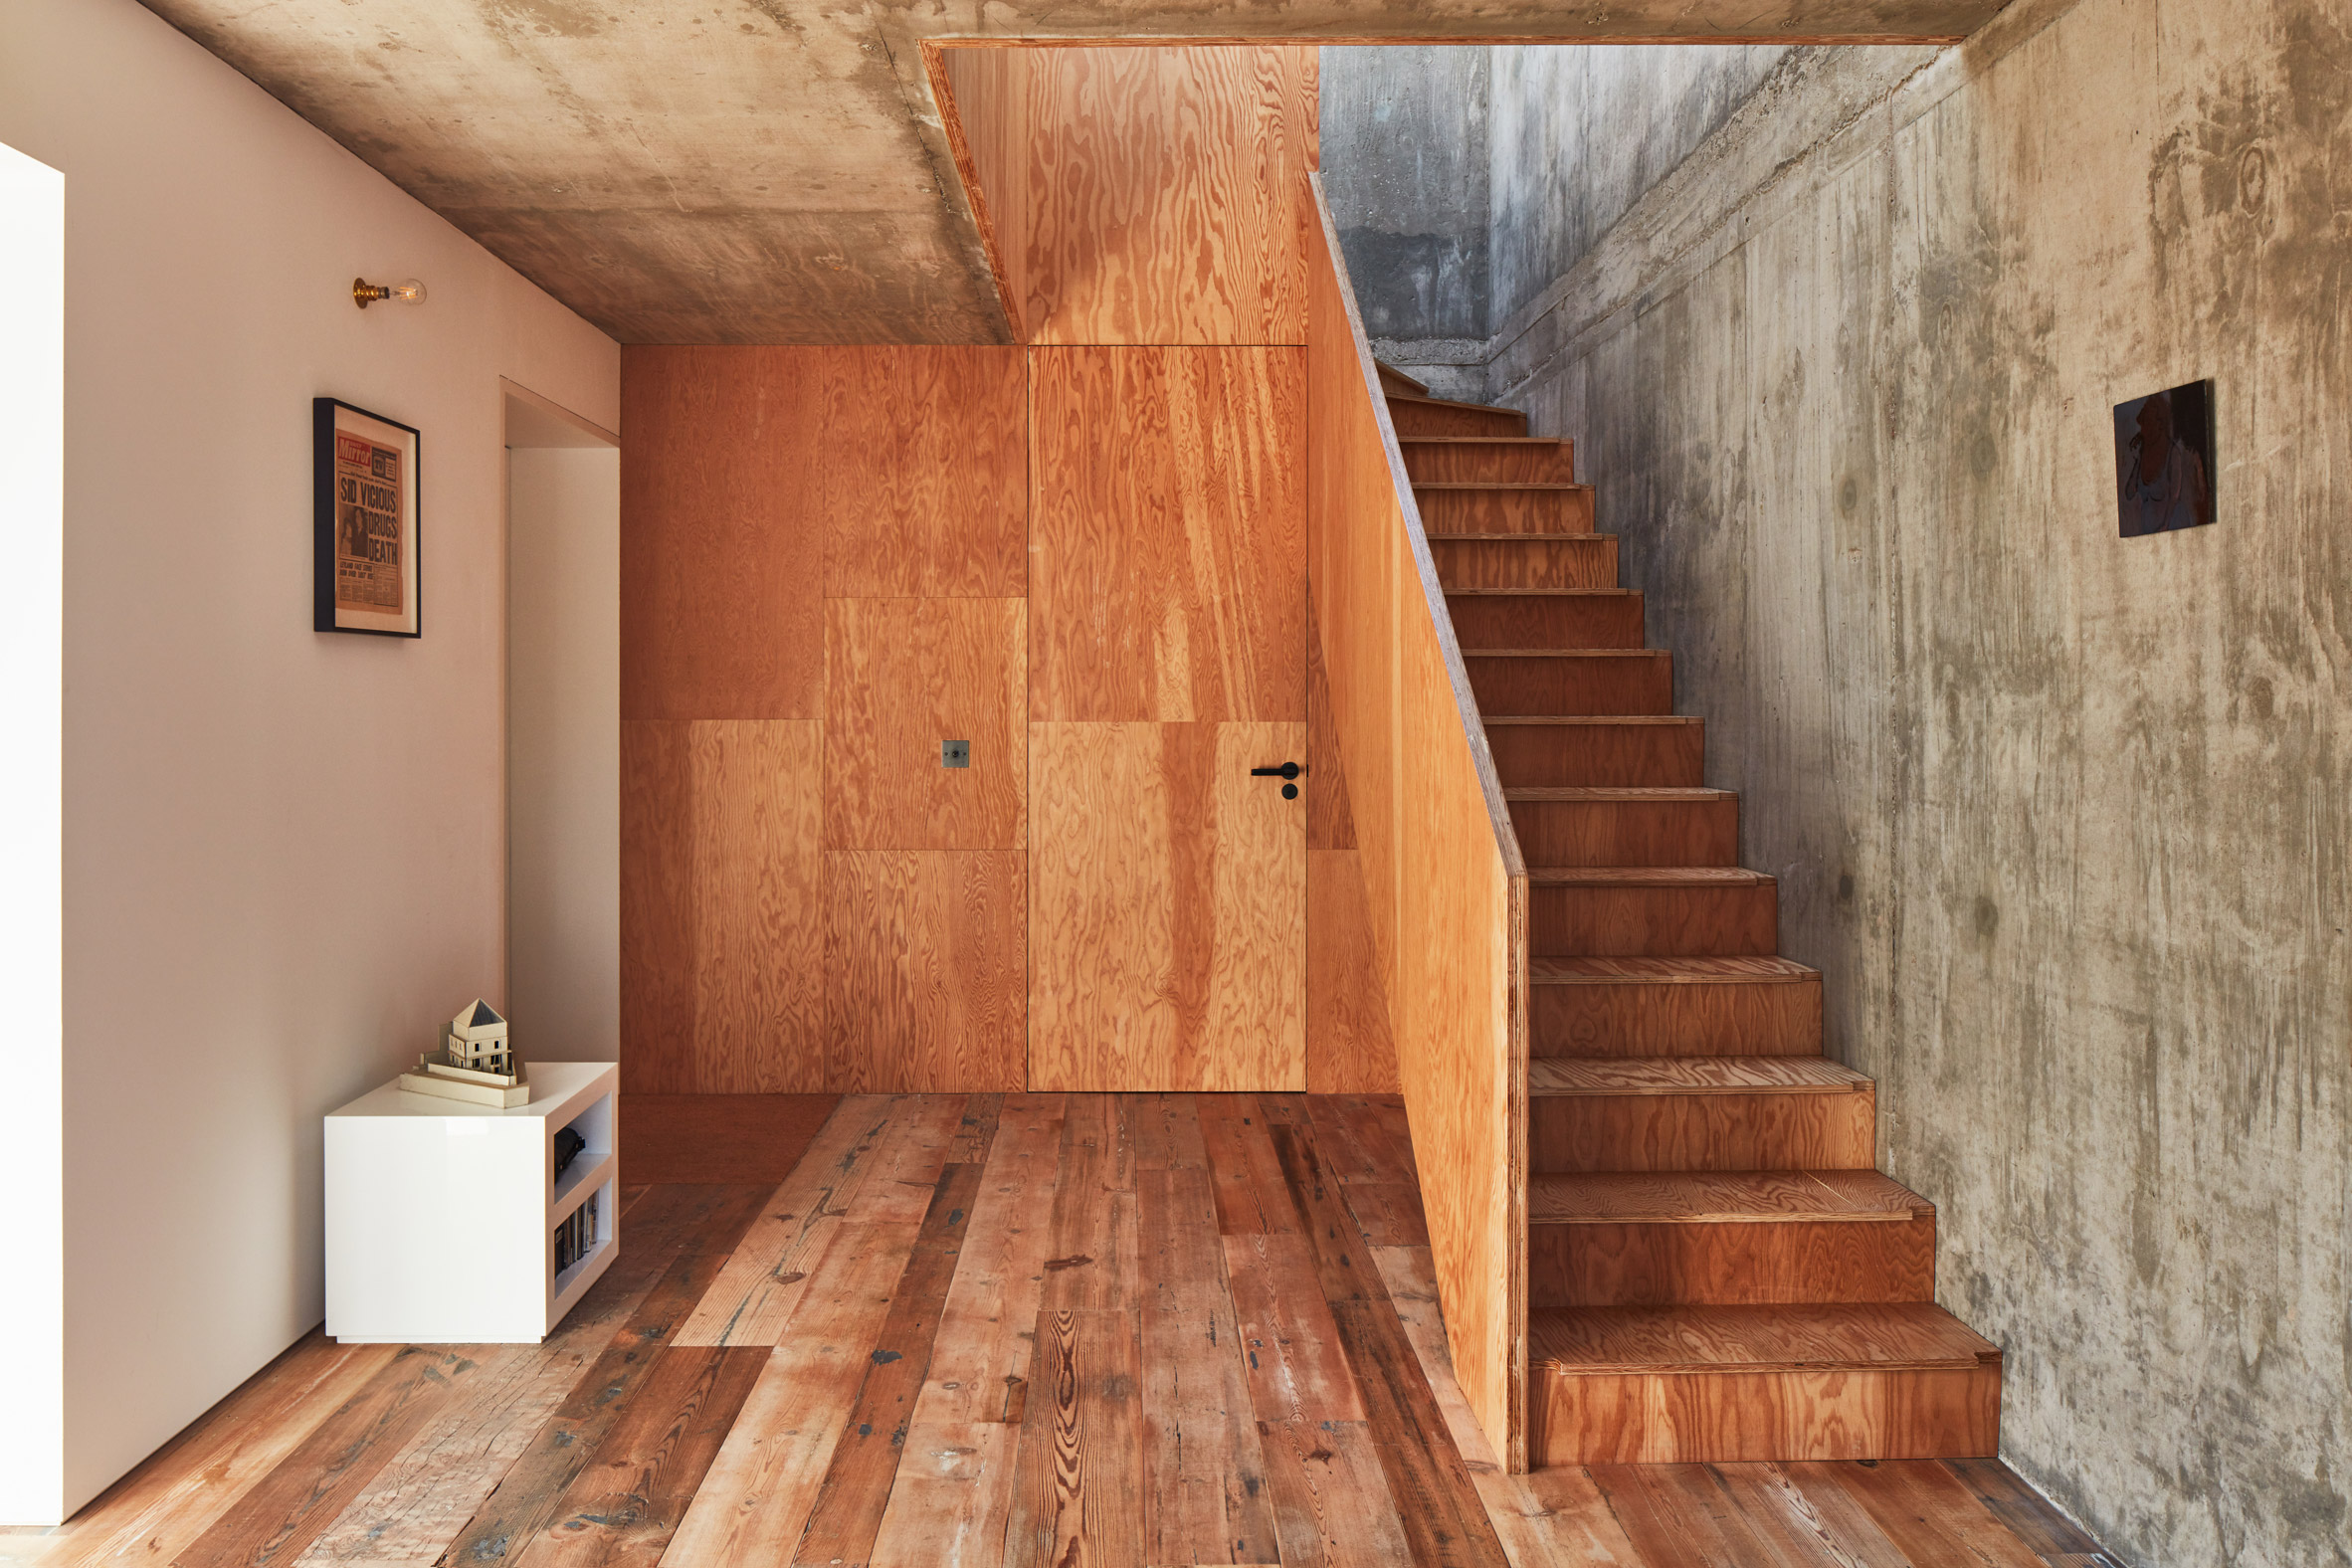 La madera, protagonista